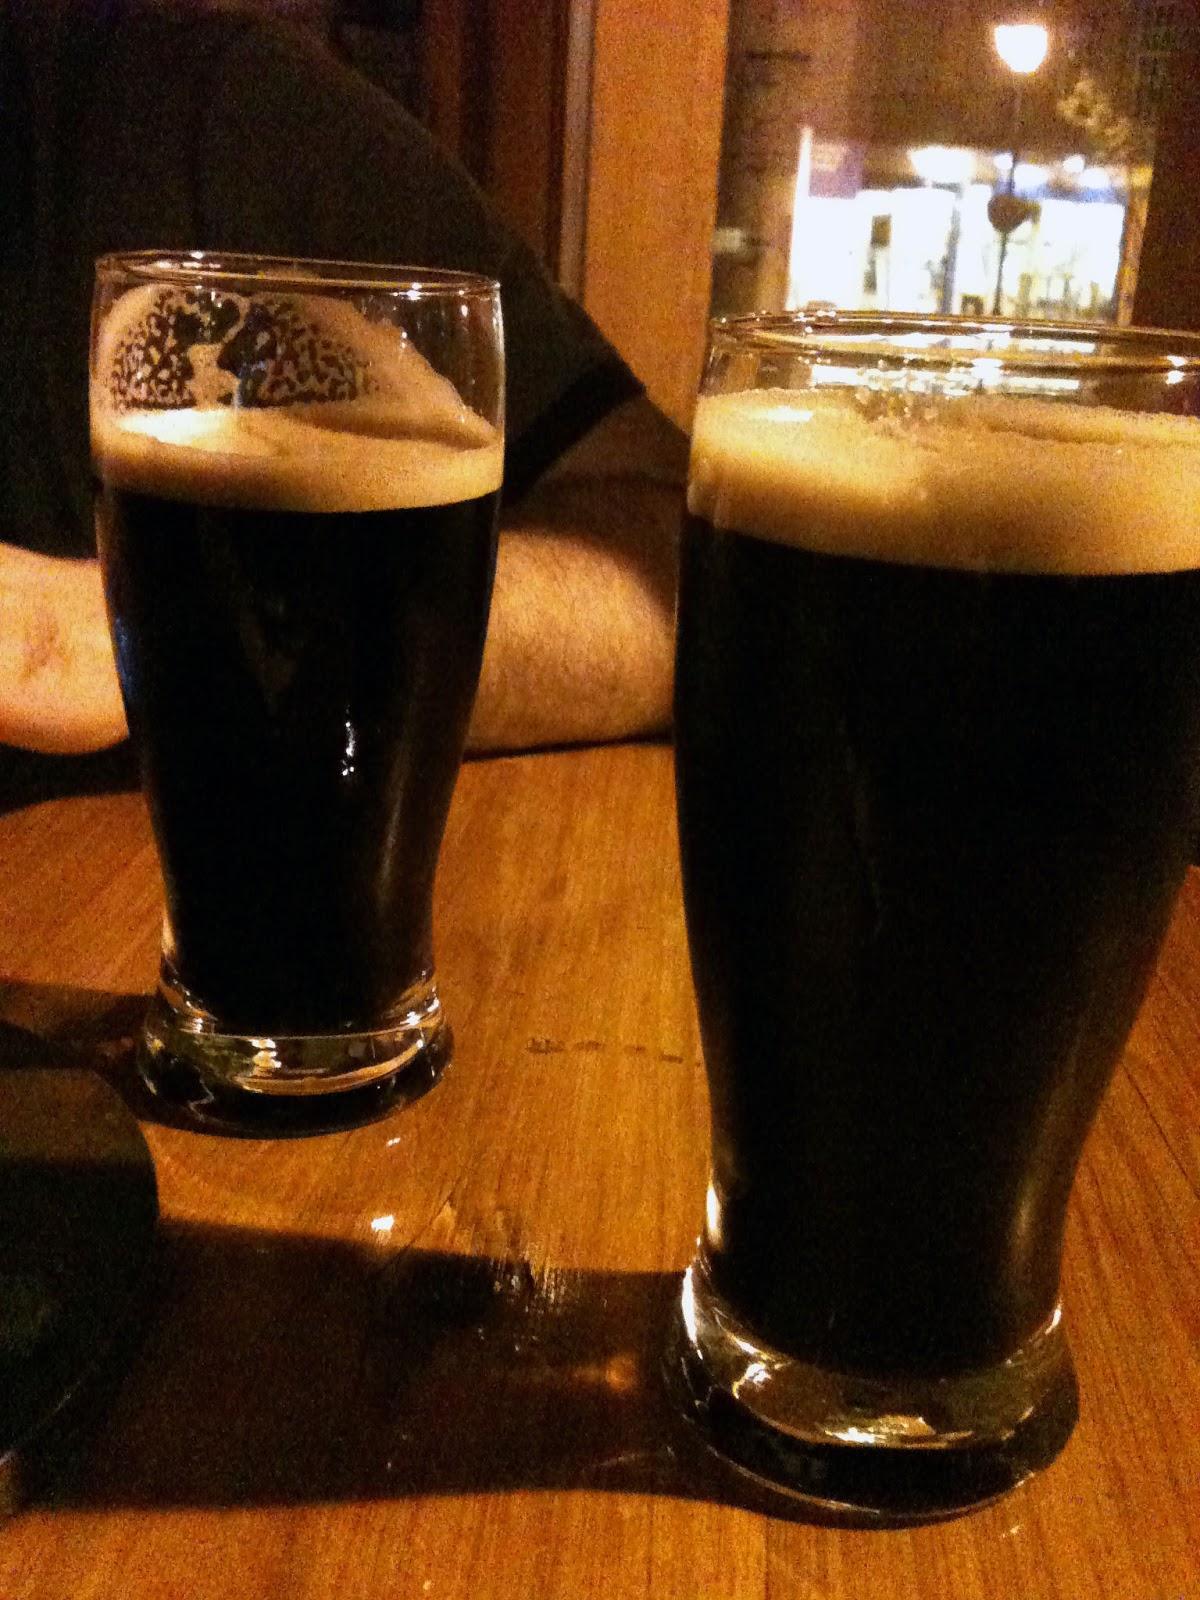 I discovered the Black Irish